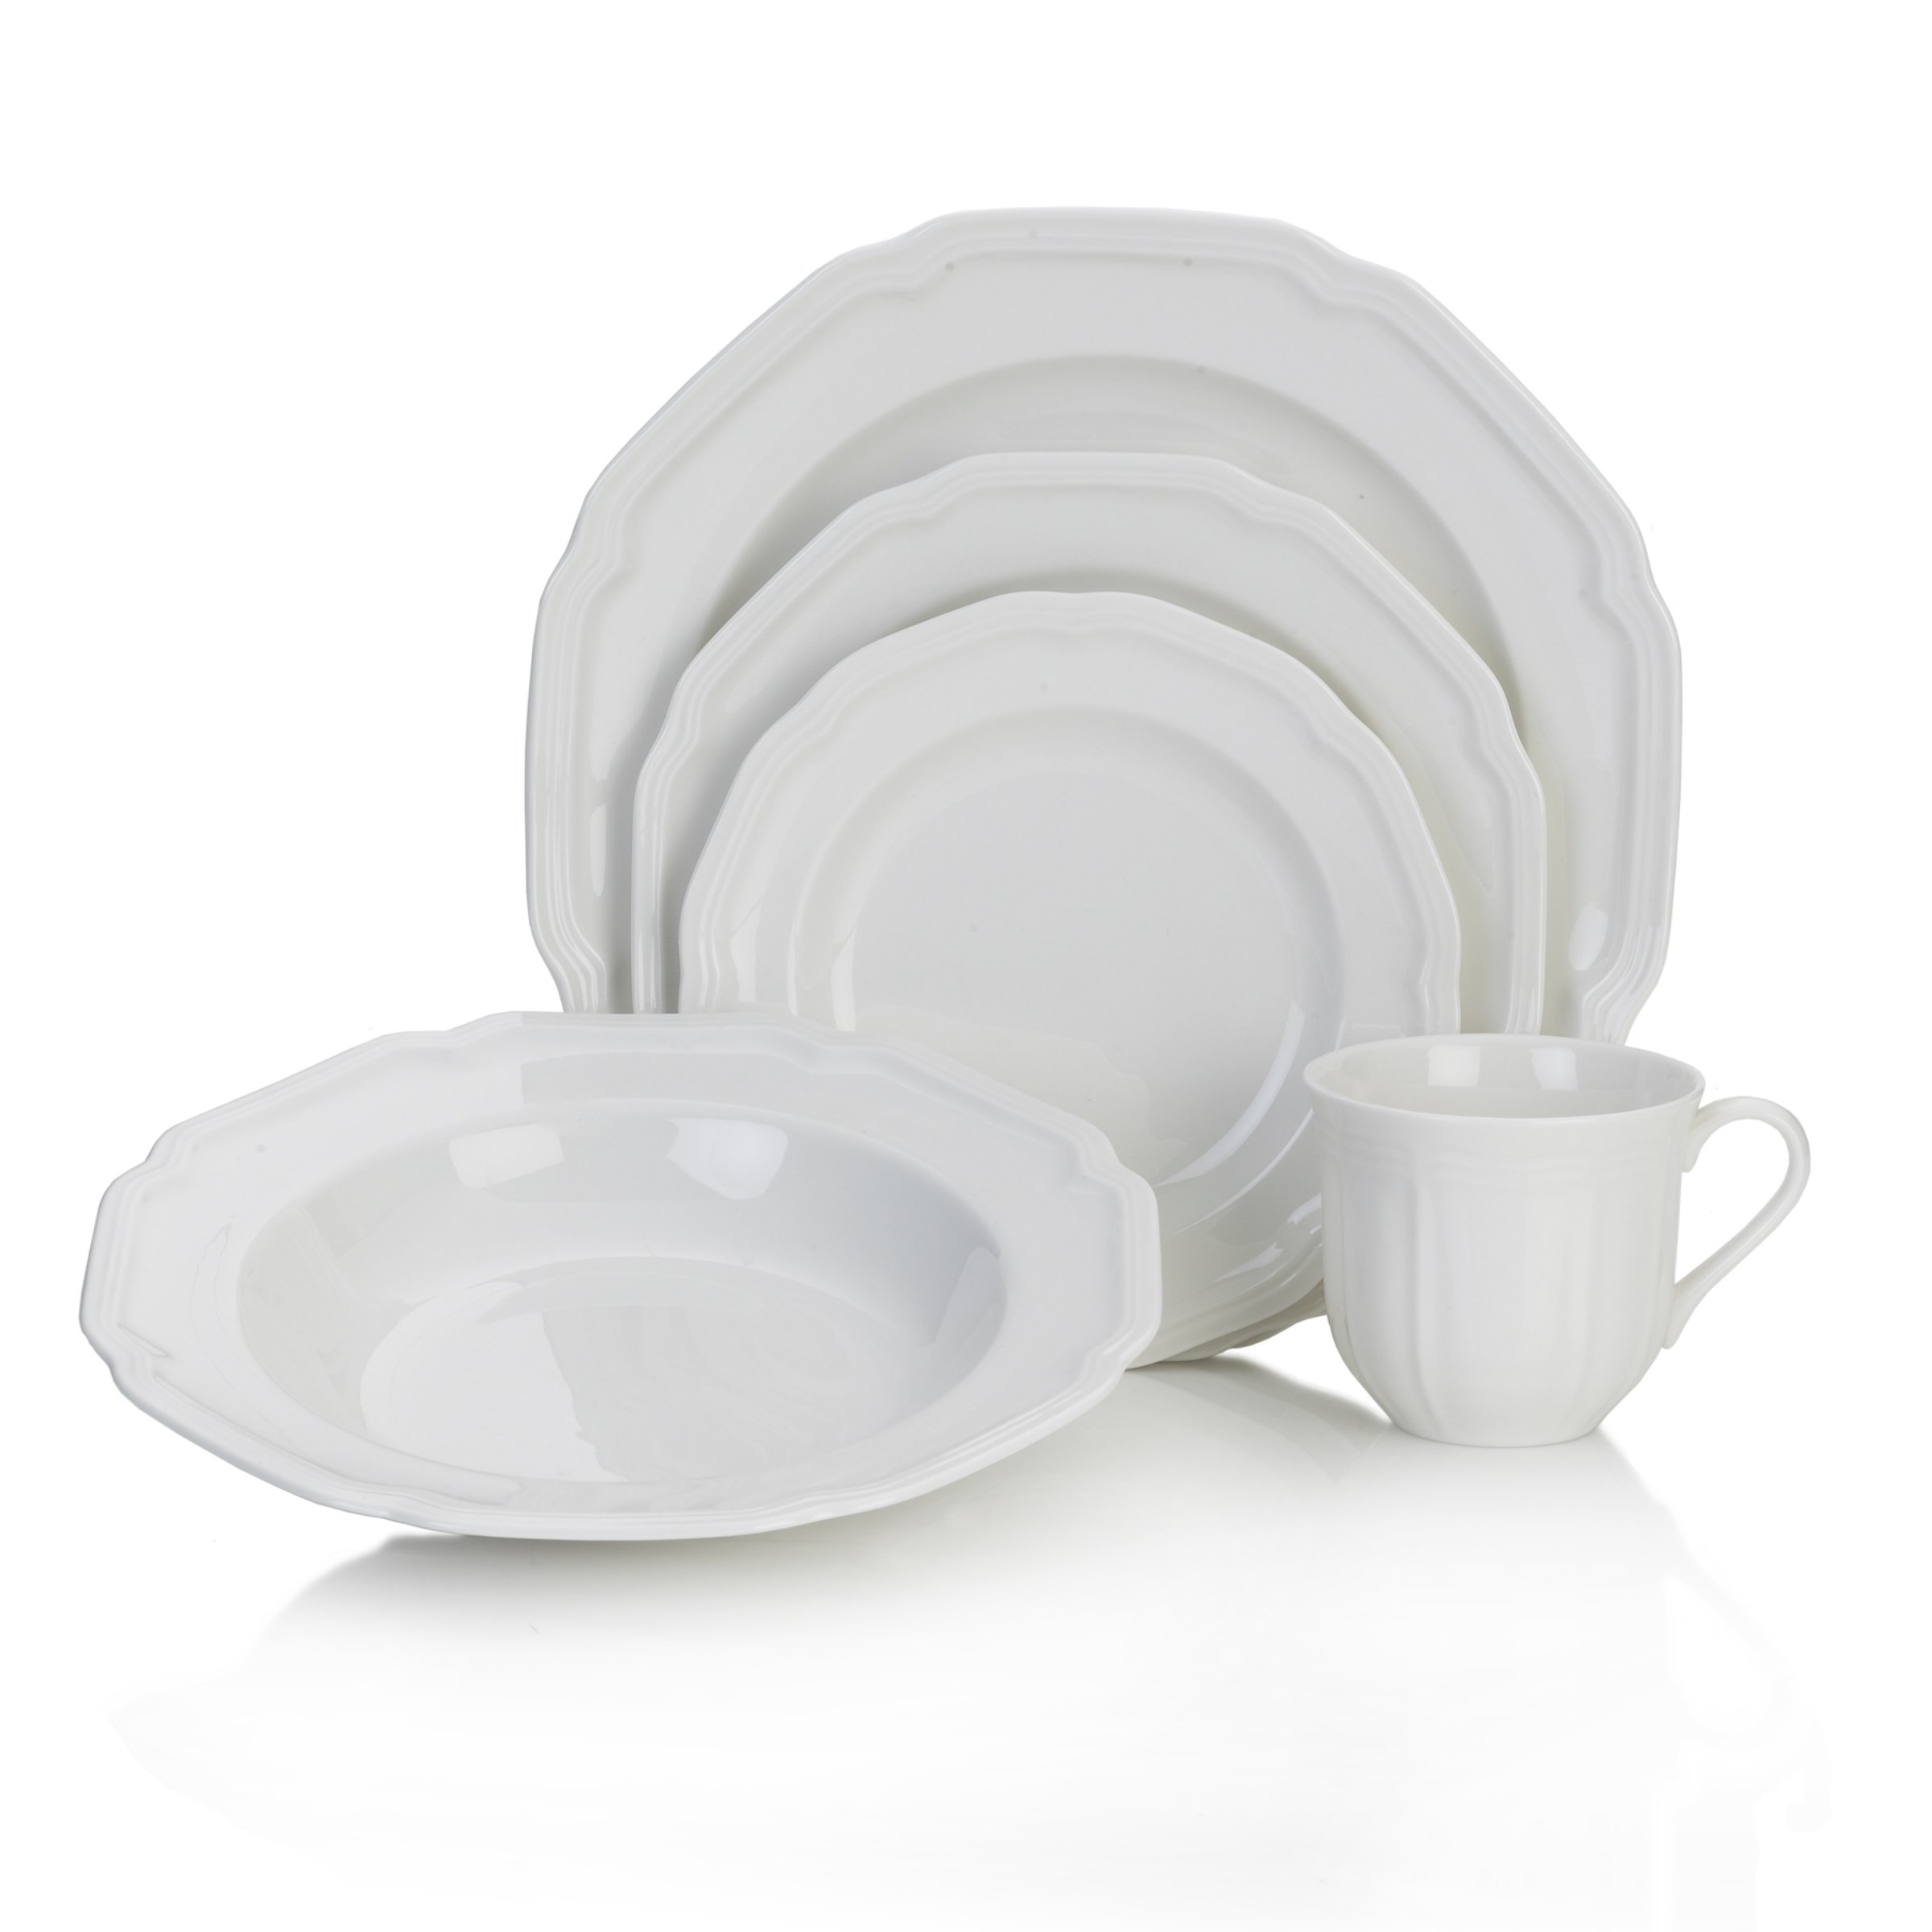 Mikasa Antique White 40-Piece Dinnerware Set, Service for 8 by Mikasa